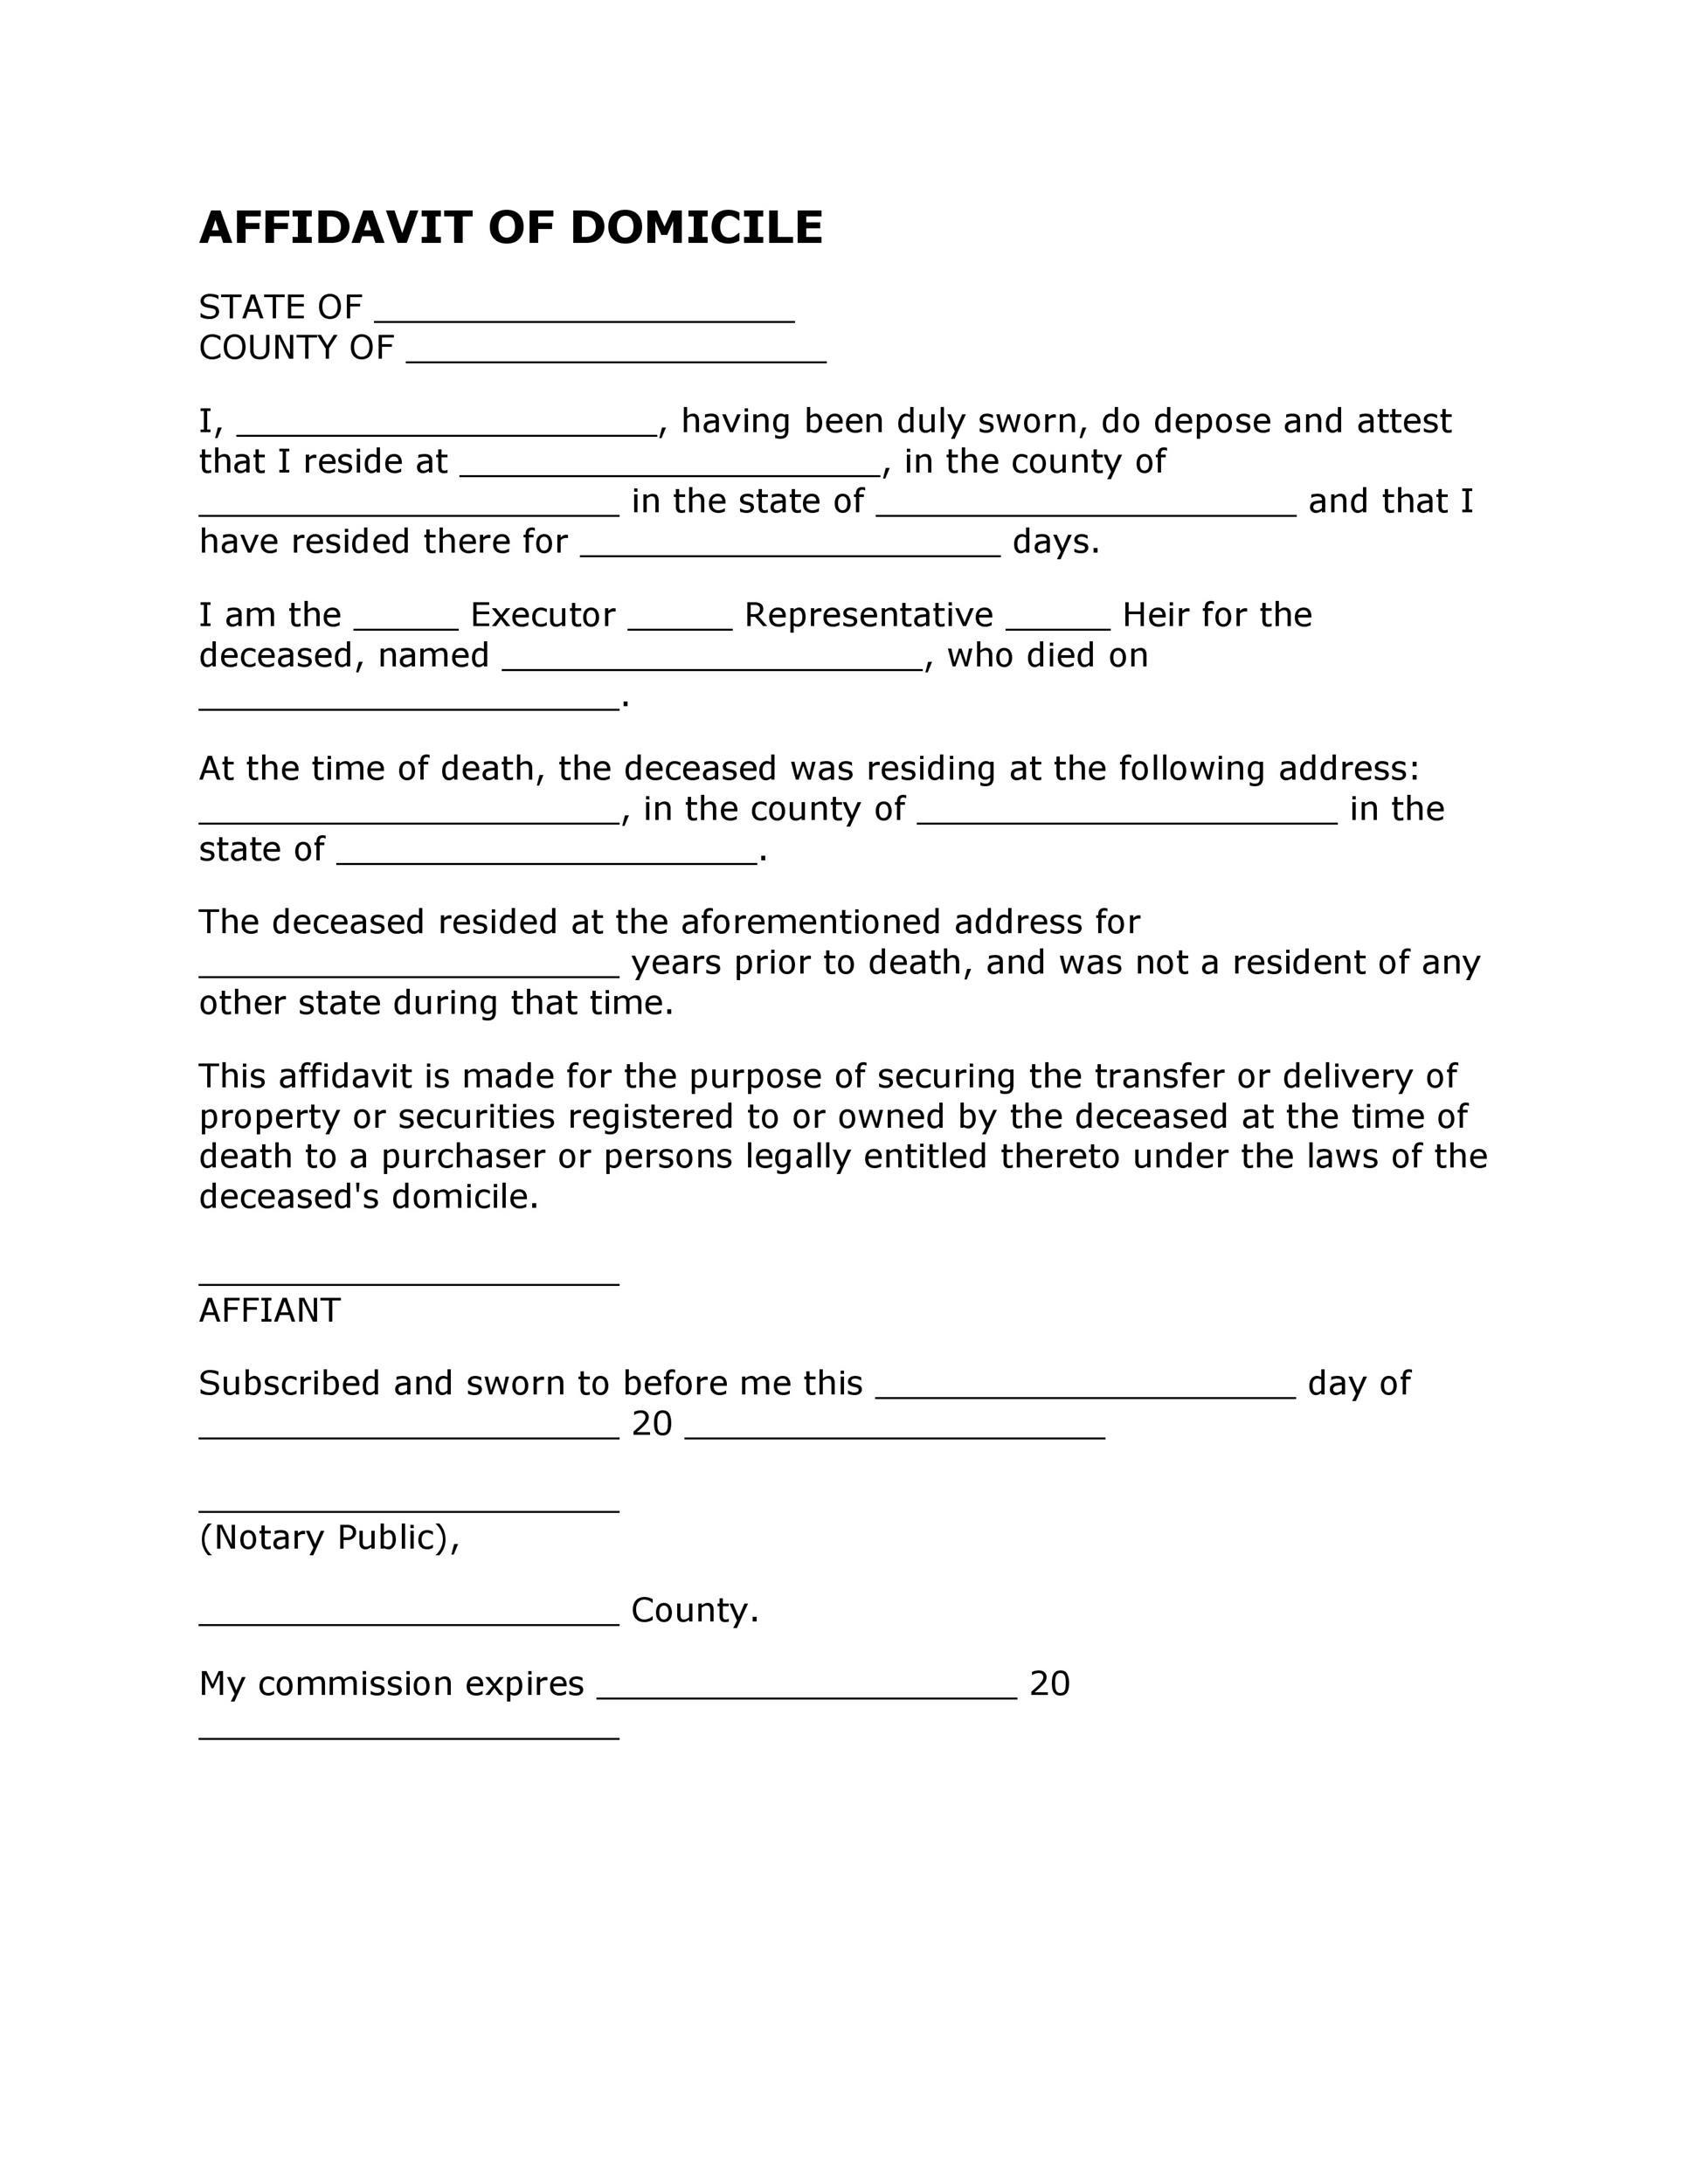 Free affidavit of domicile 47